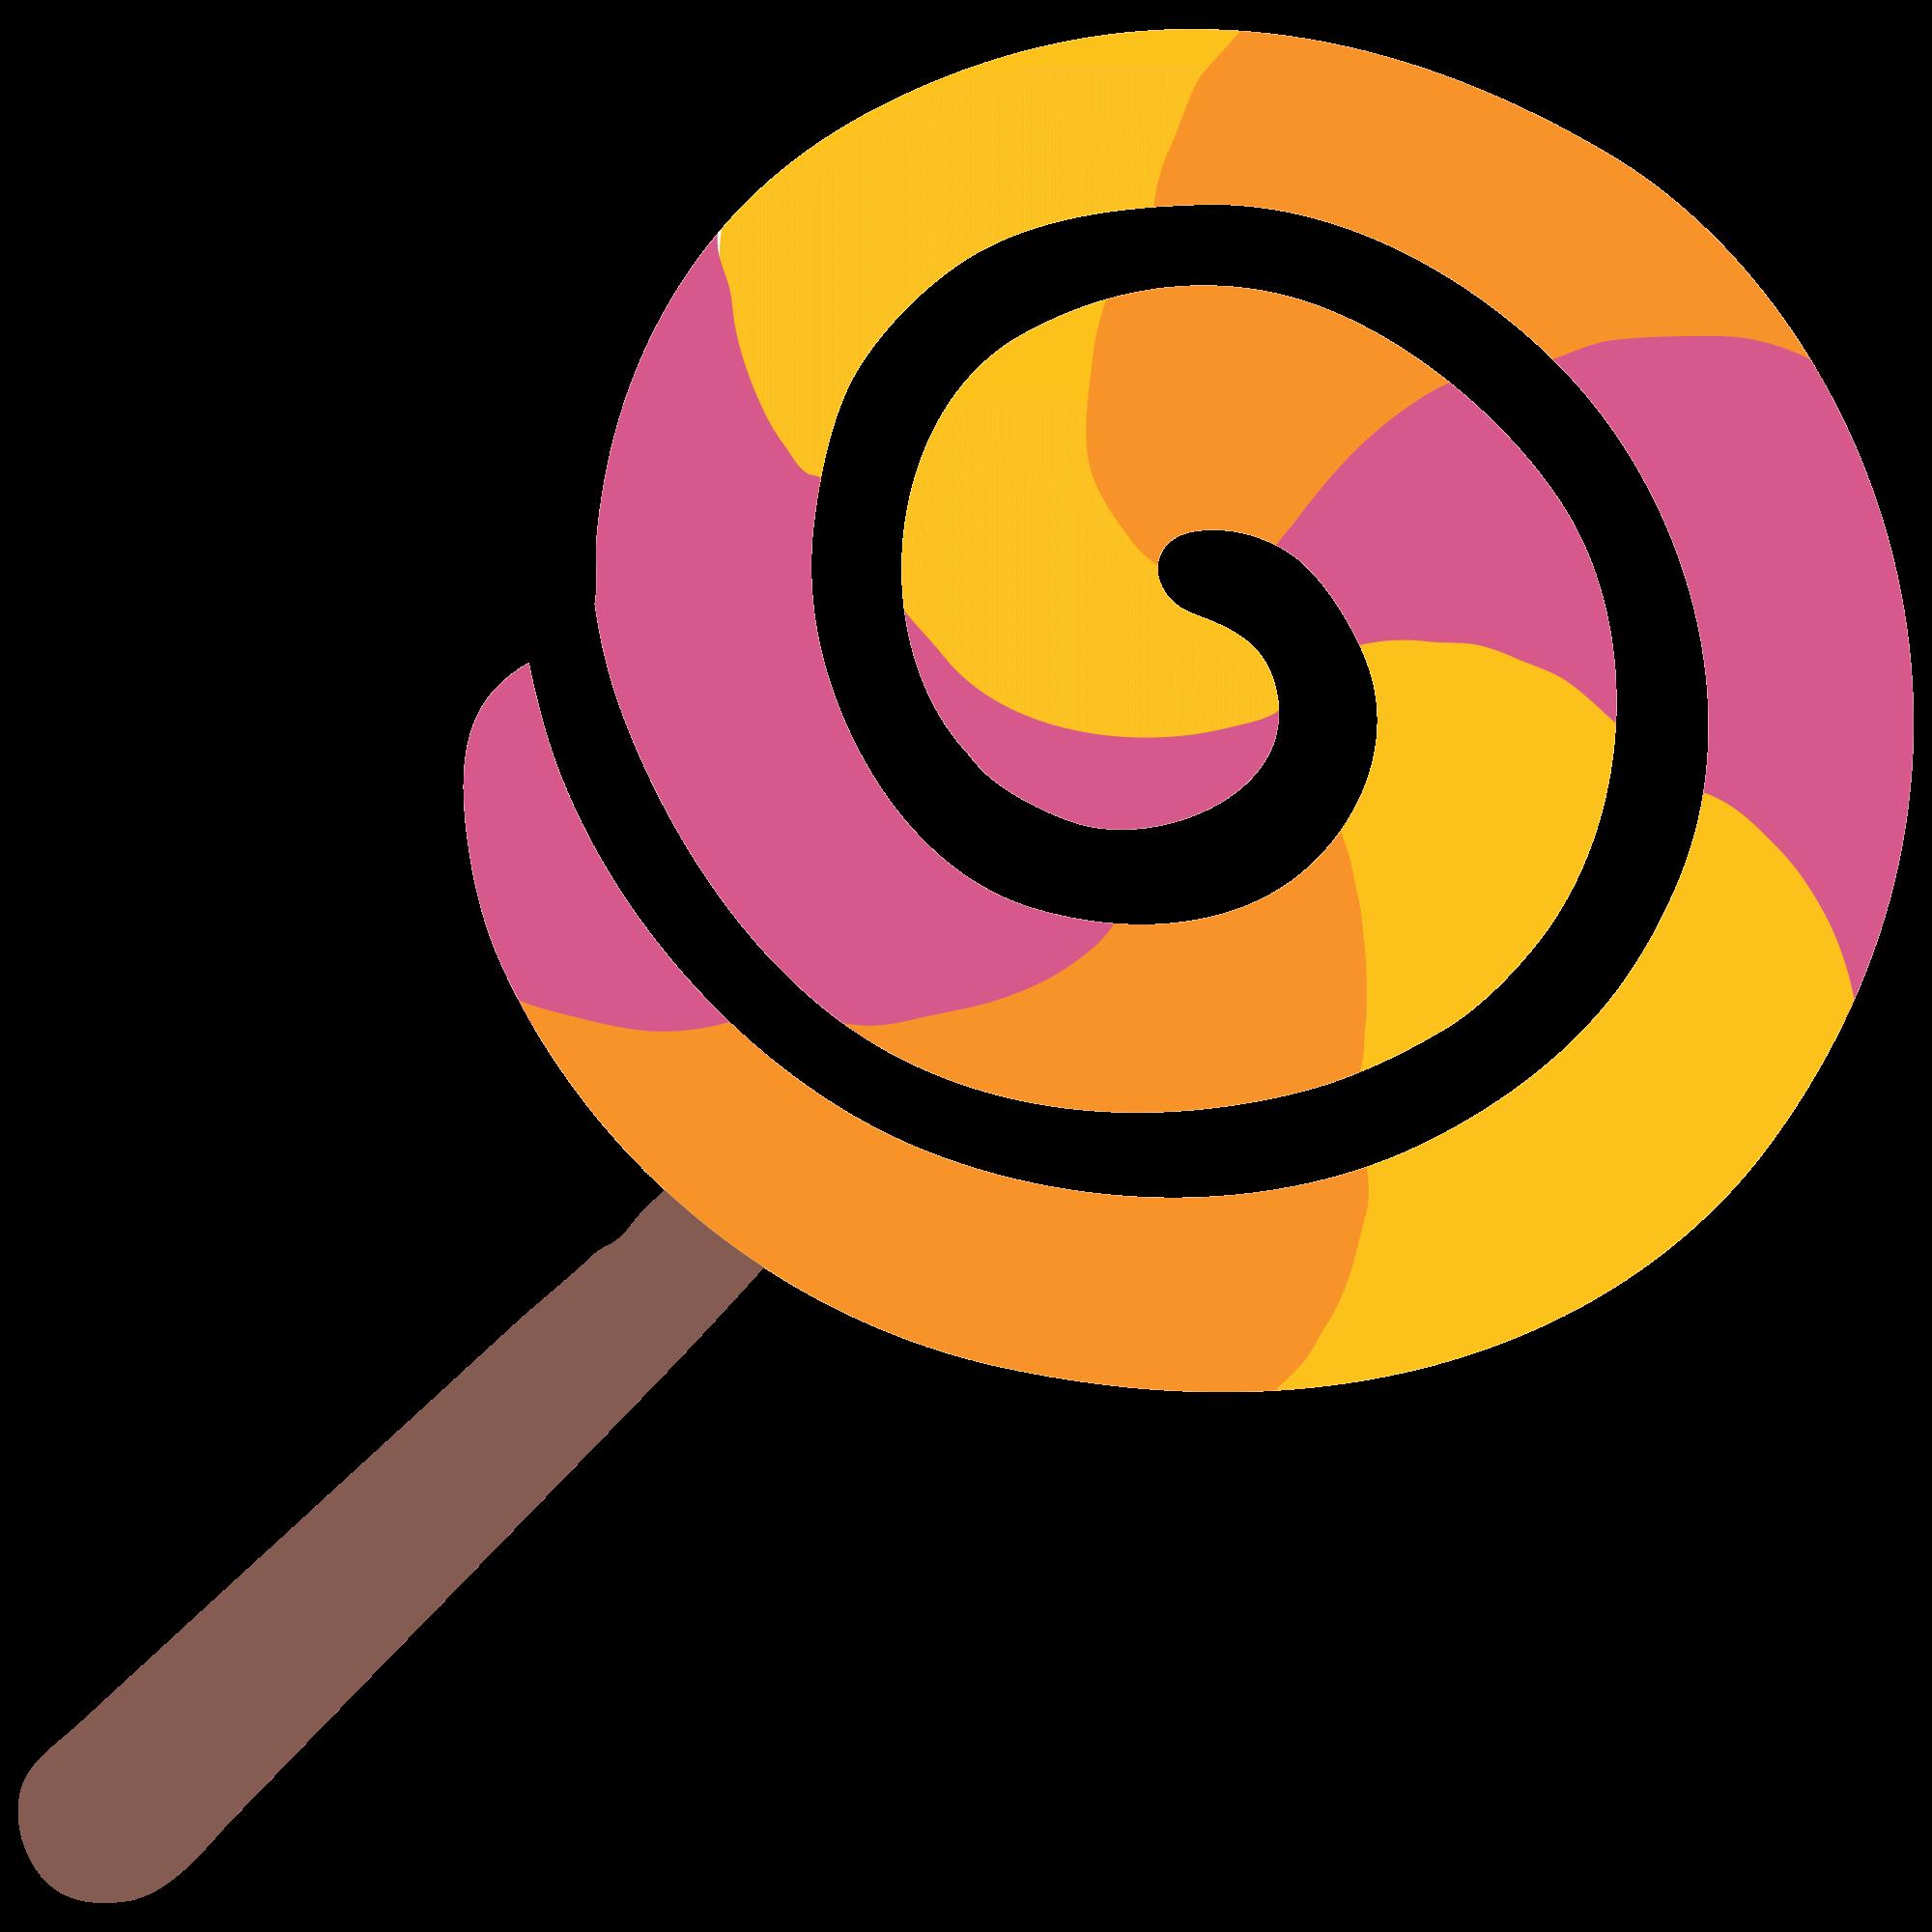 lollipop clipart lolipop